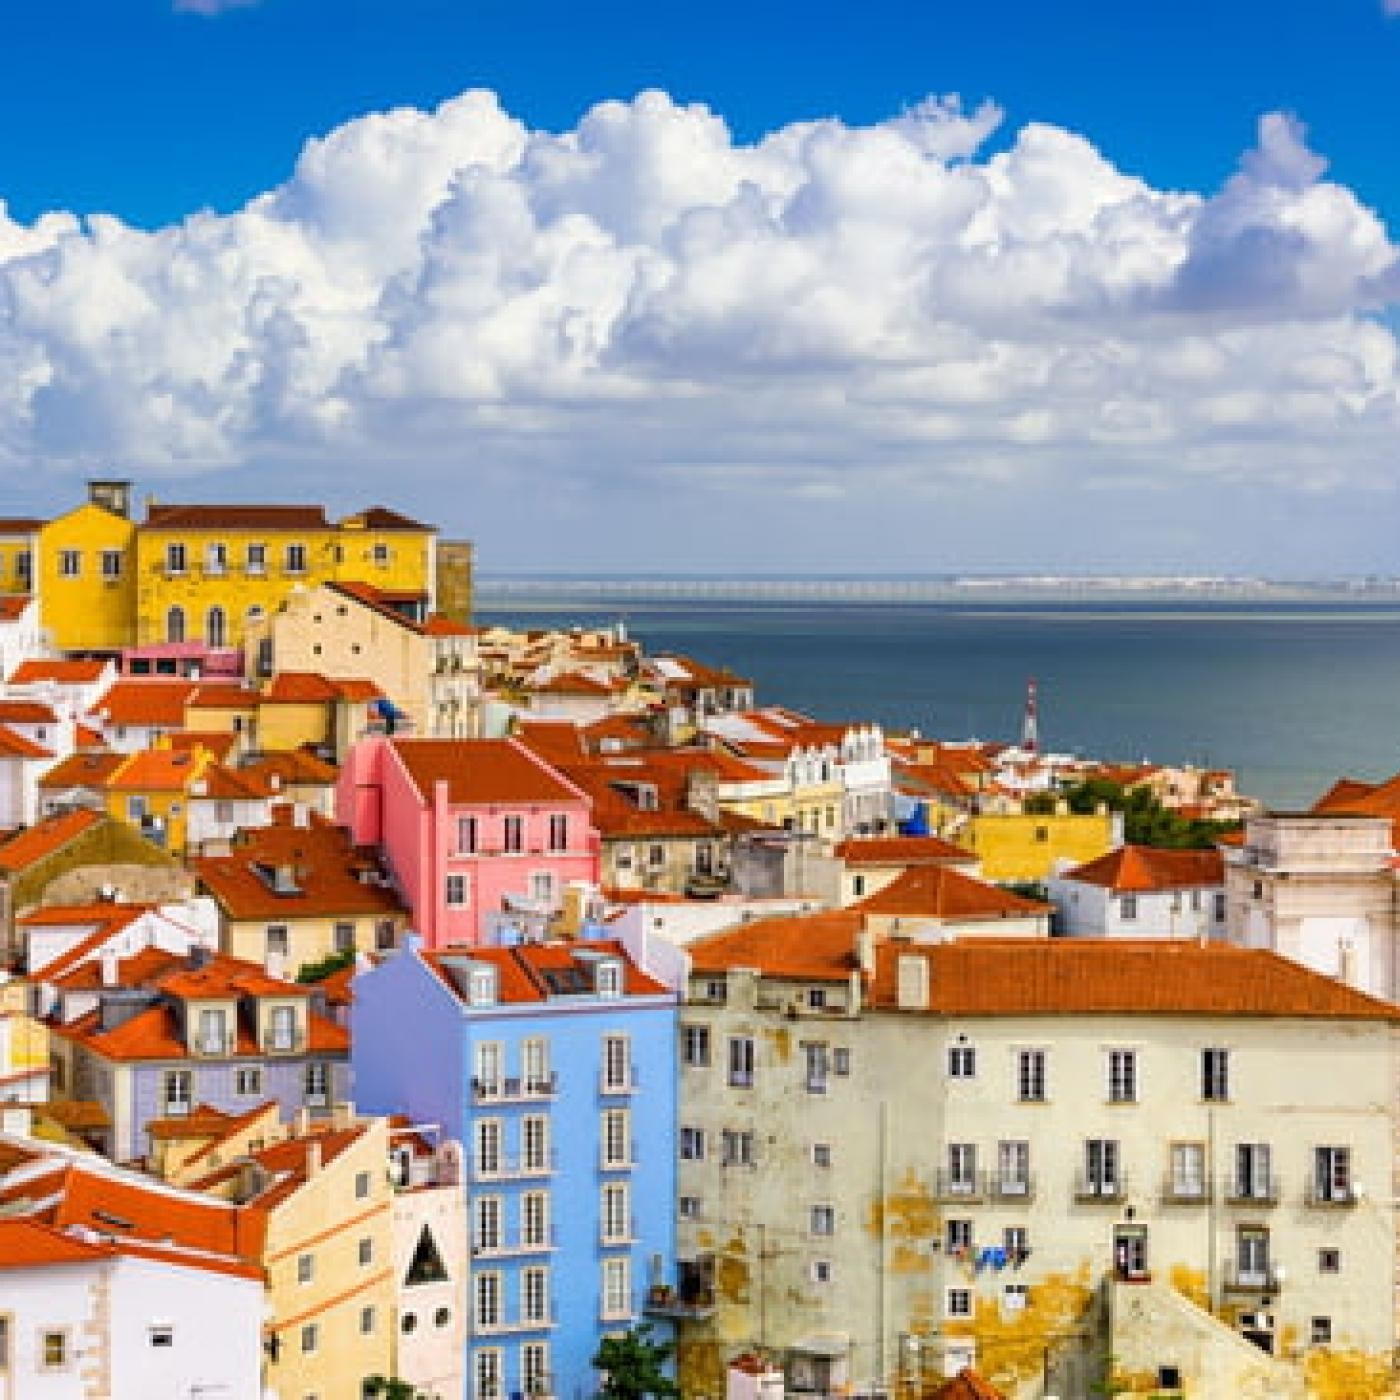 Clément en Erasmus à Lisbonne - Portugal - 23 11 2020 - StereoChic Radio